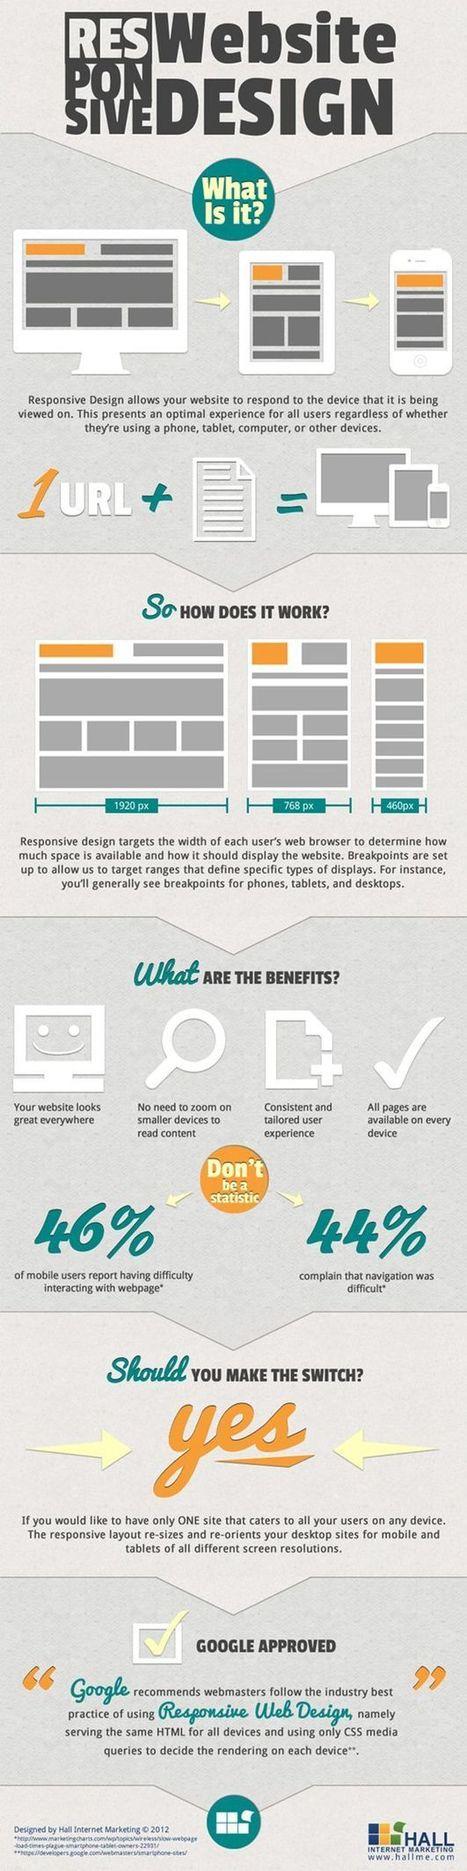 [#Infographie] Comprendre le #responsive design facilement ! - ID'seed, germe de communication | Branding | Scoop.it